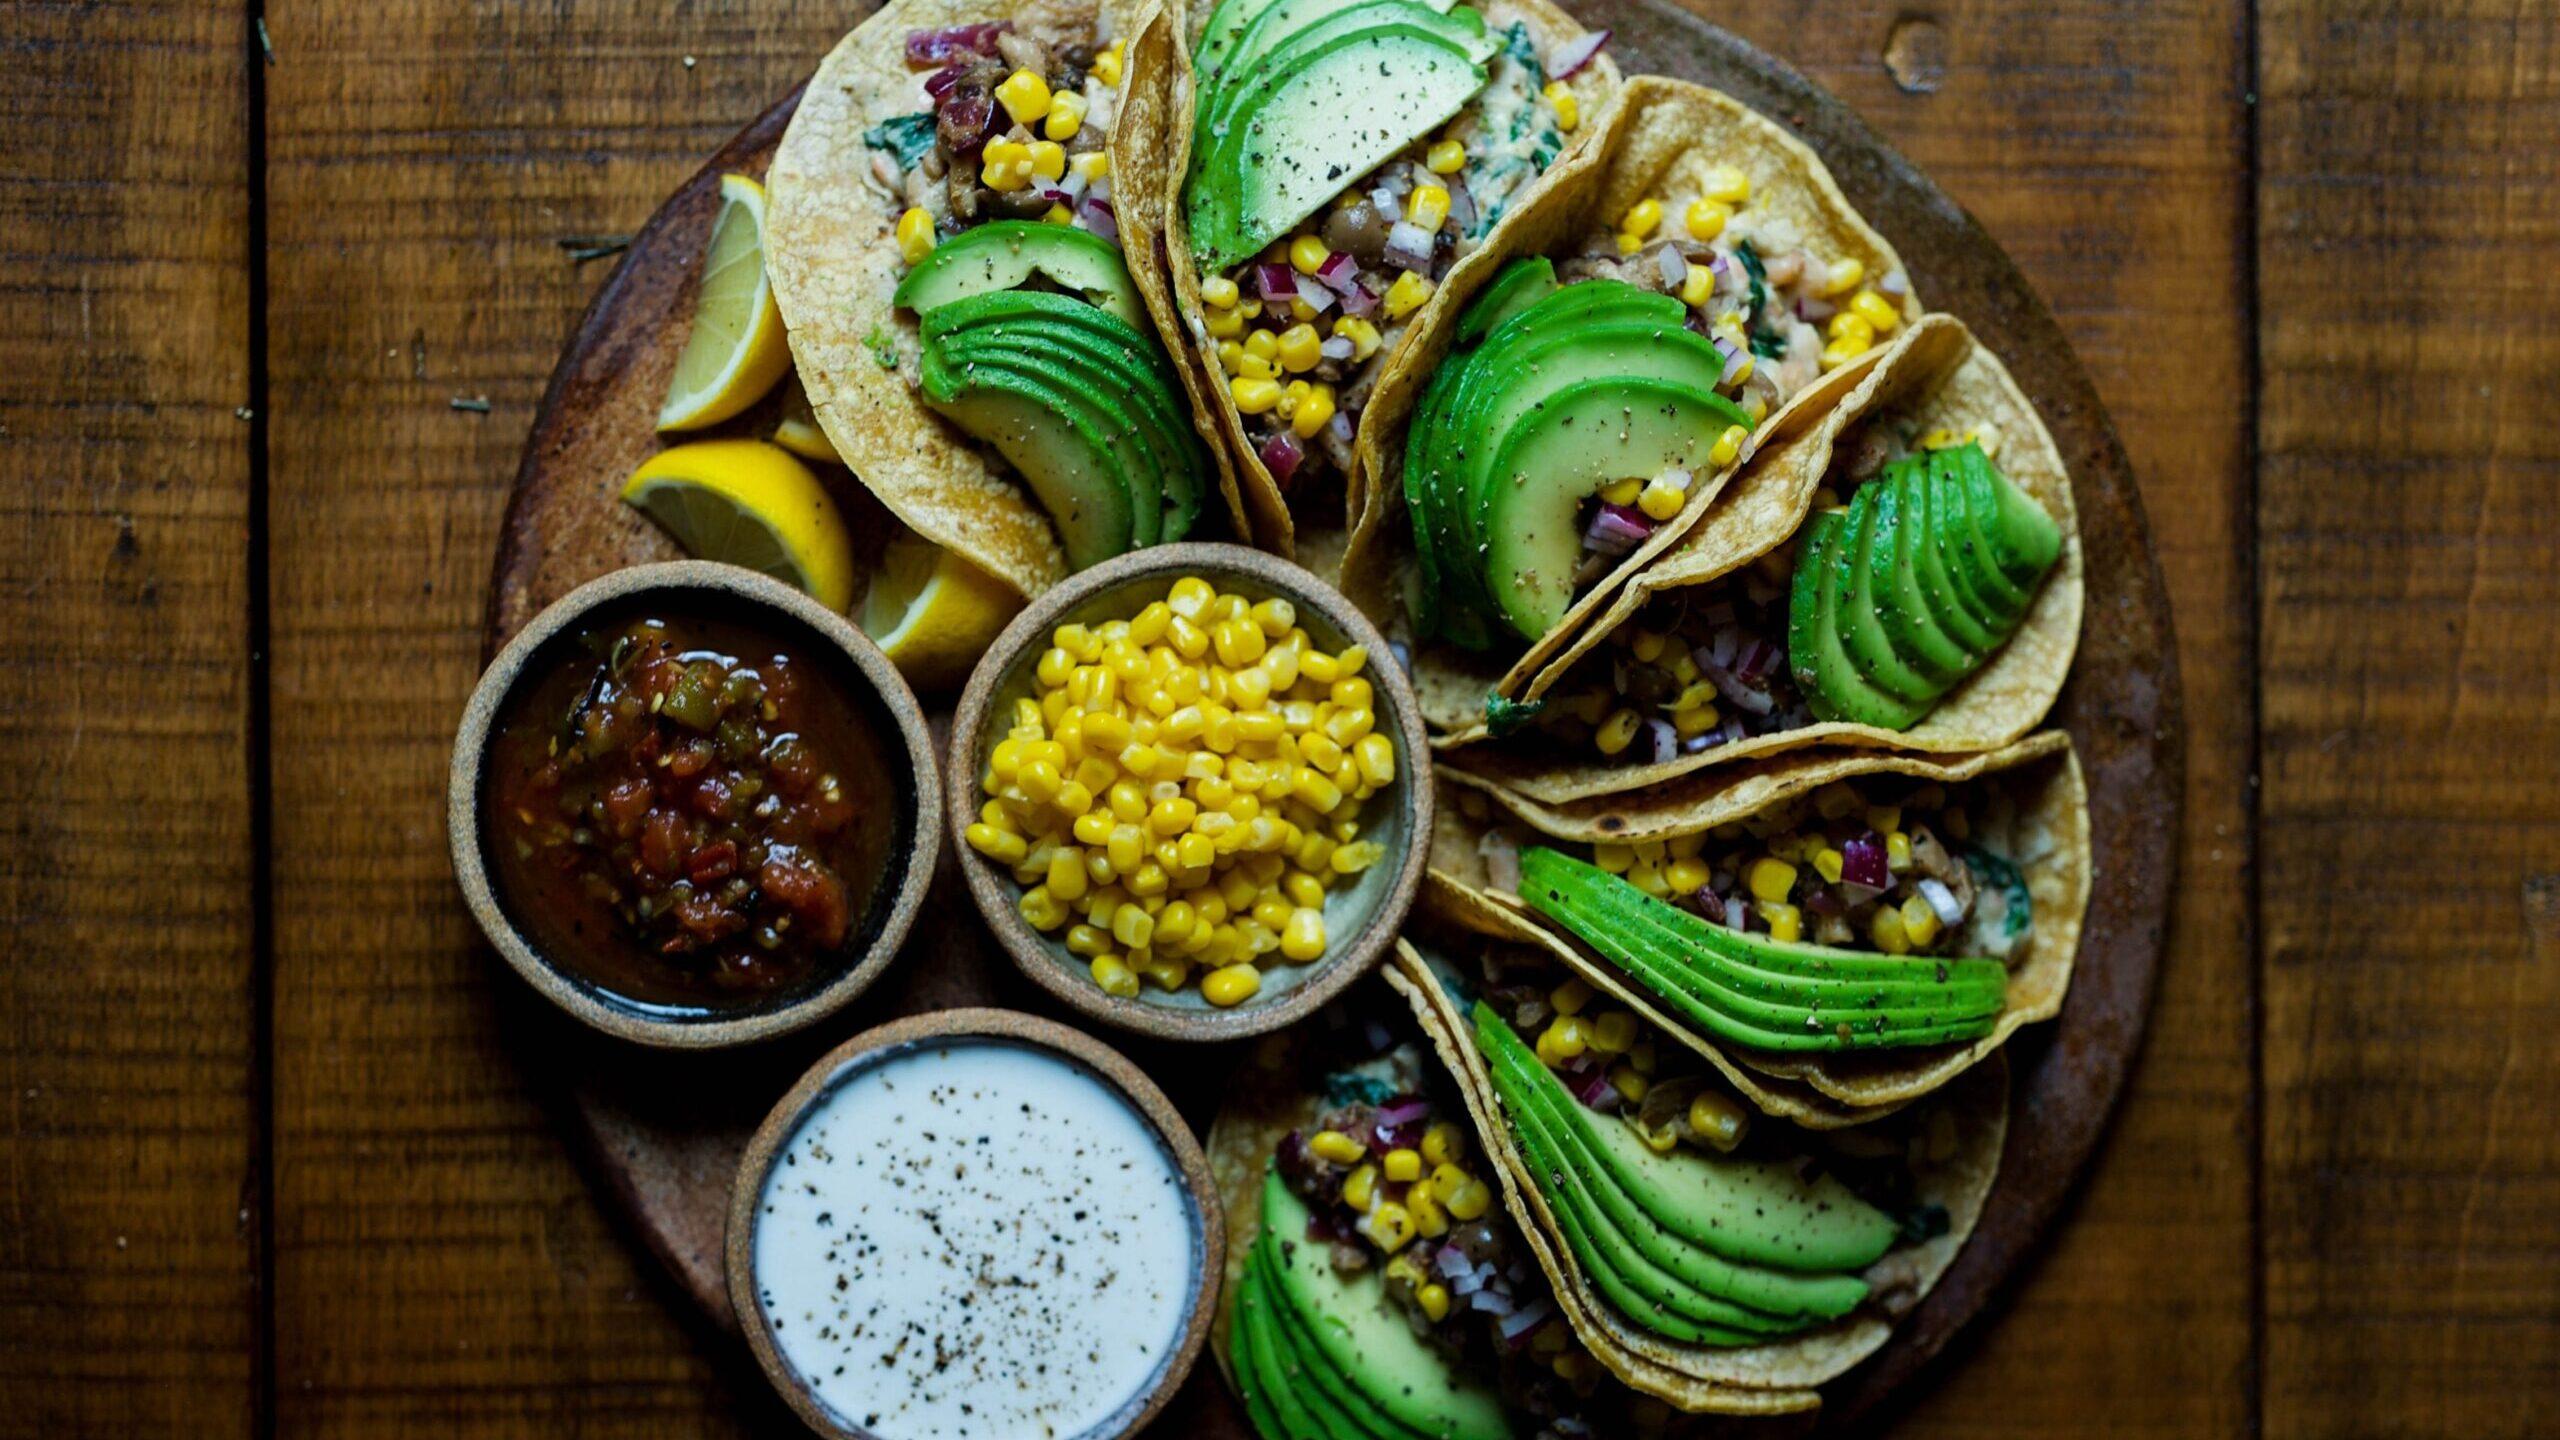 Taste Treat: Mexican Cuisine Is Ideal For Vegans